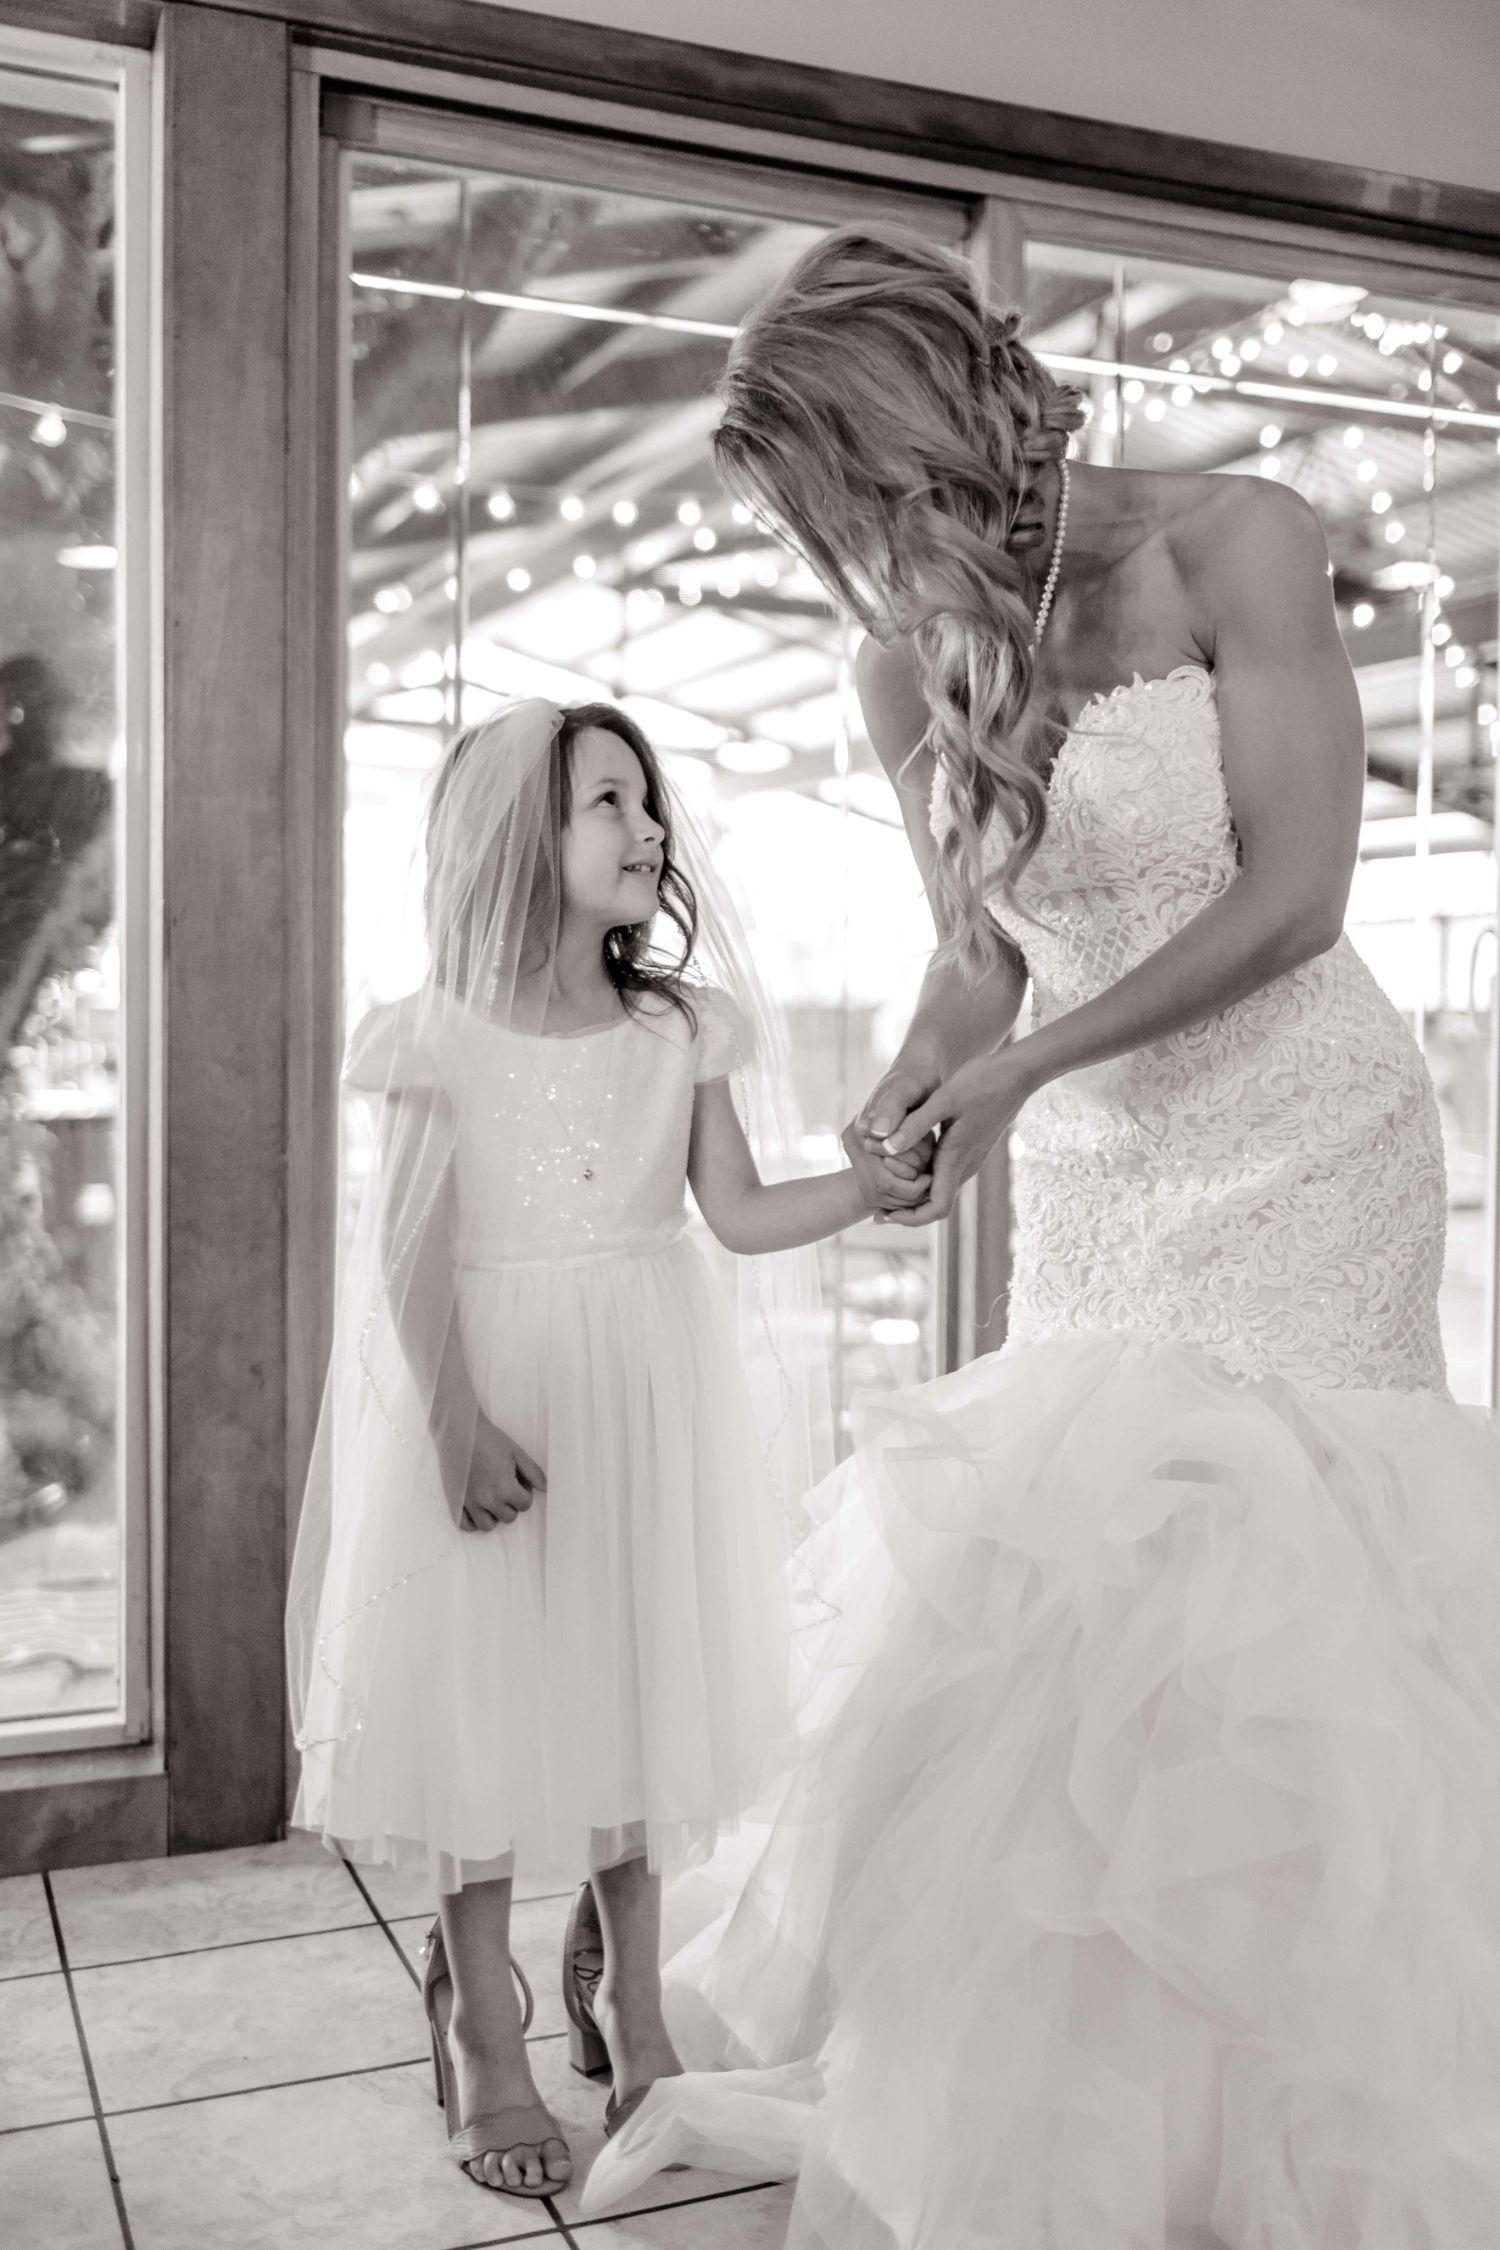 wichita-falls-wedding-katelyn-colten-vernon-texas-11.jpg